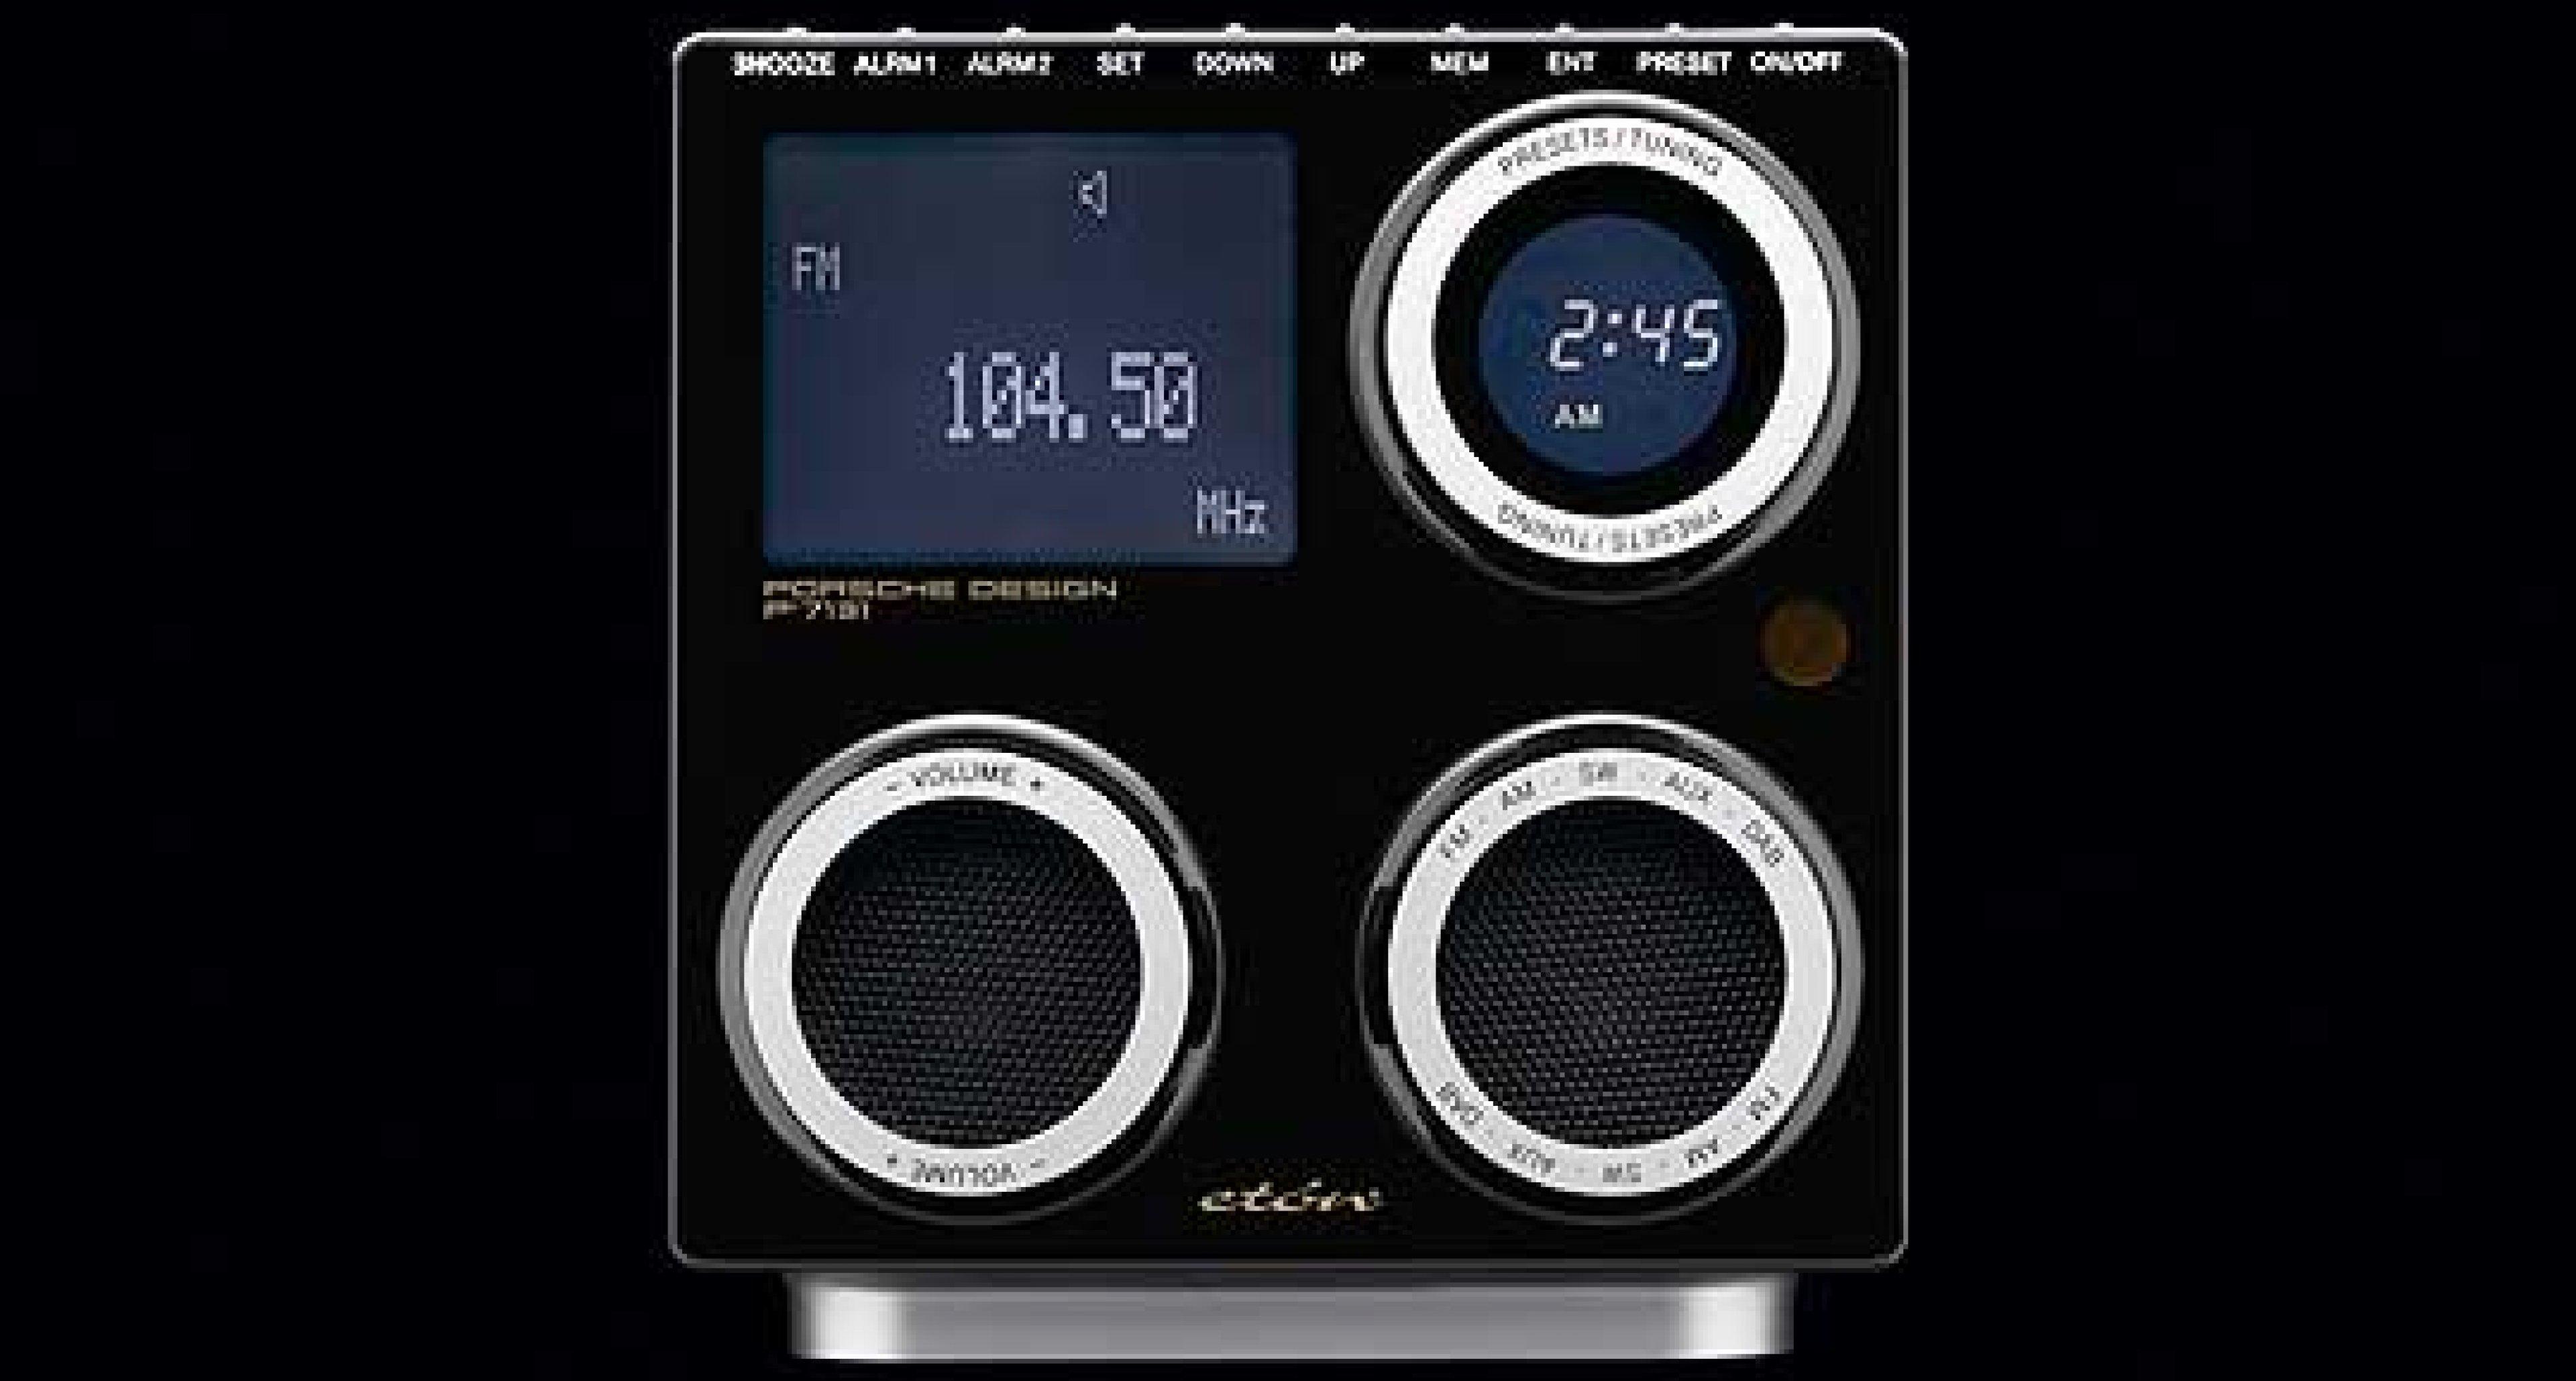 Porsche Design P'7131: Das Porsche Radio